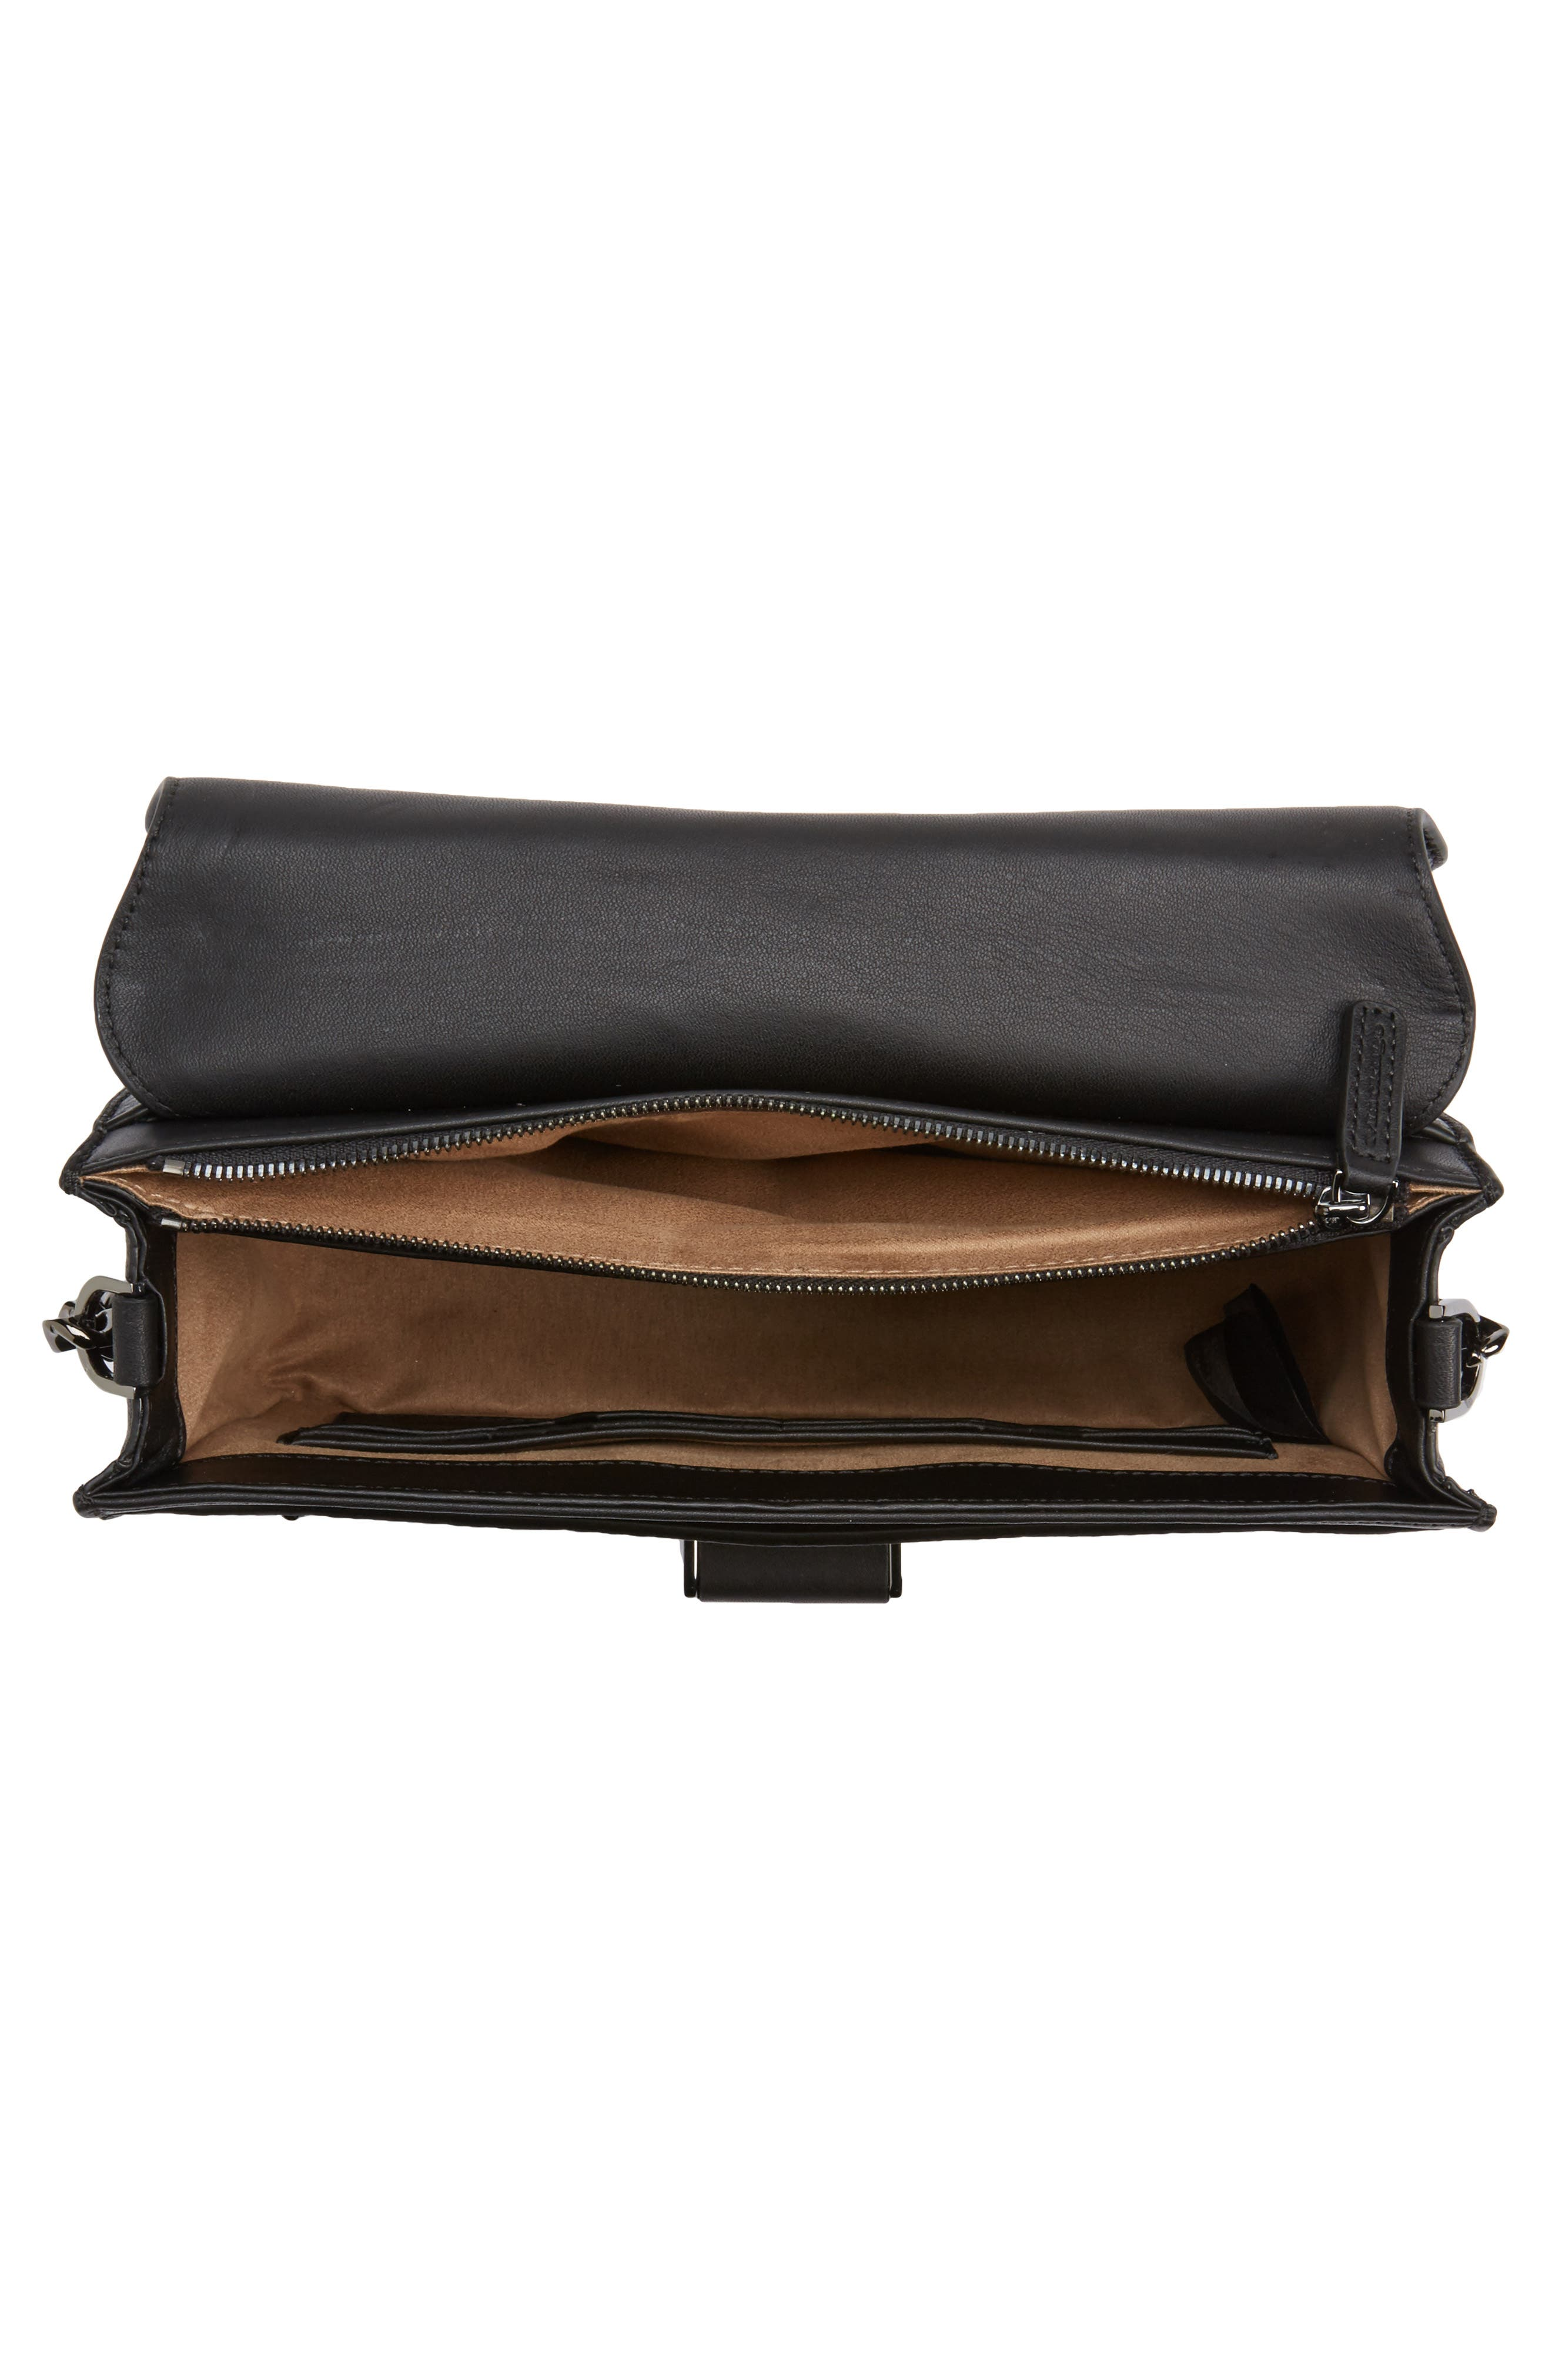 Cortney Nappa Leather Shoulder/Crossbody Bag,                             Alternate thumbnail 13, color,